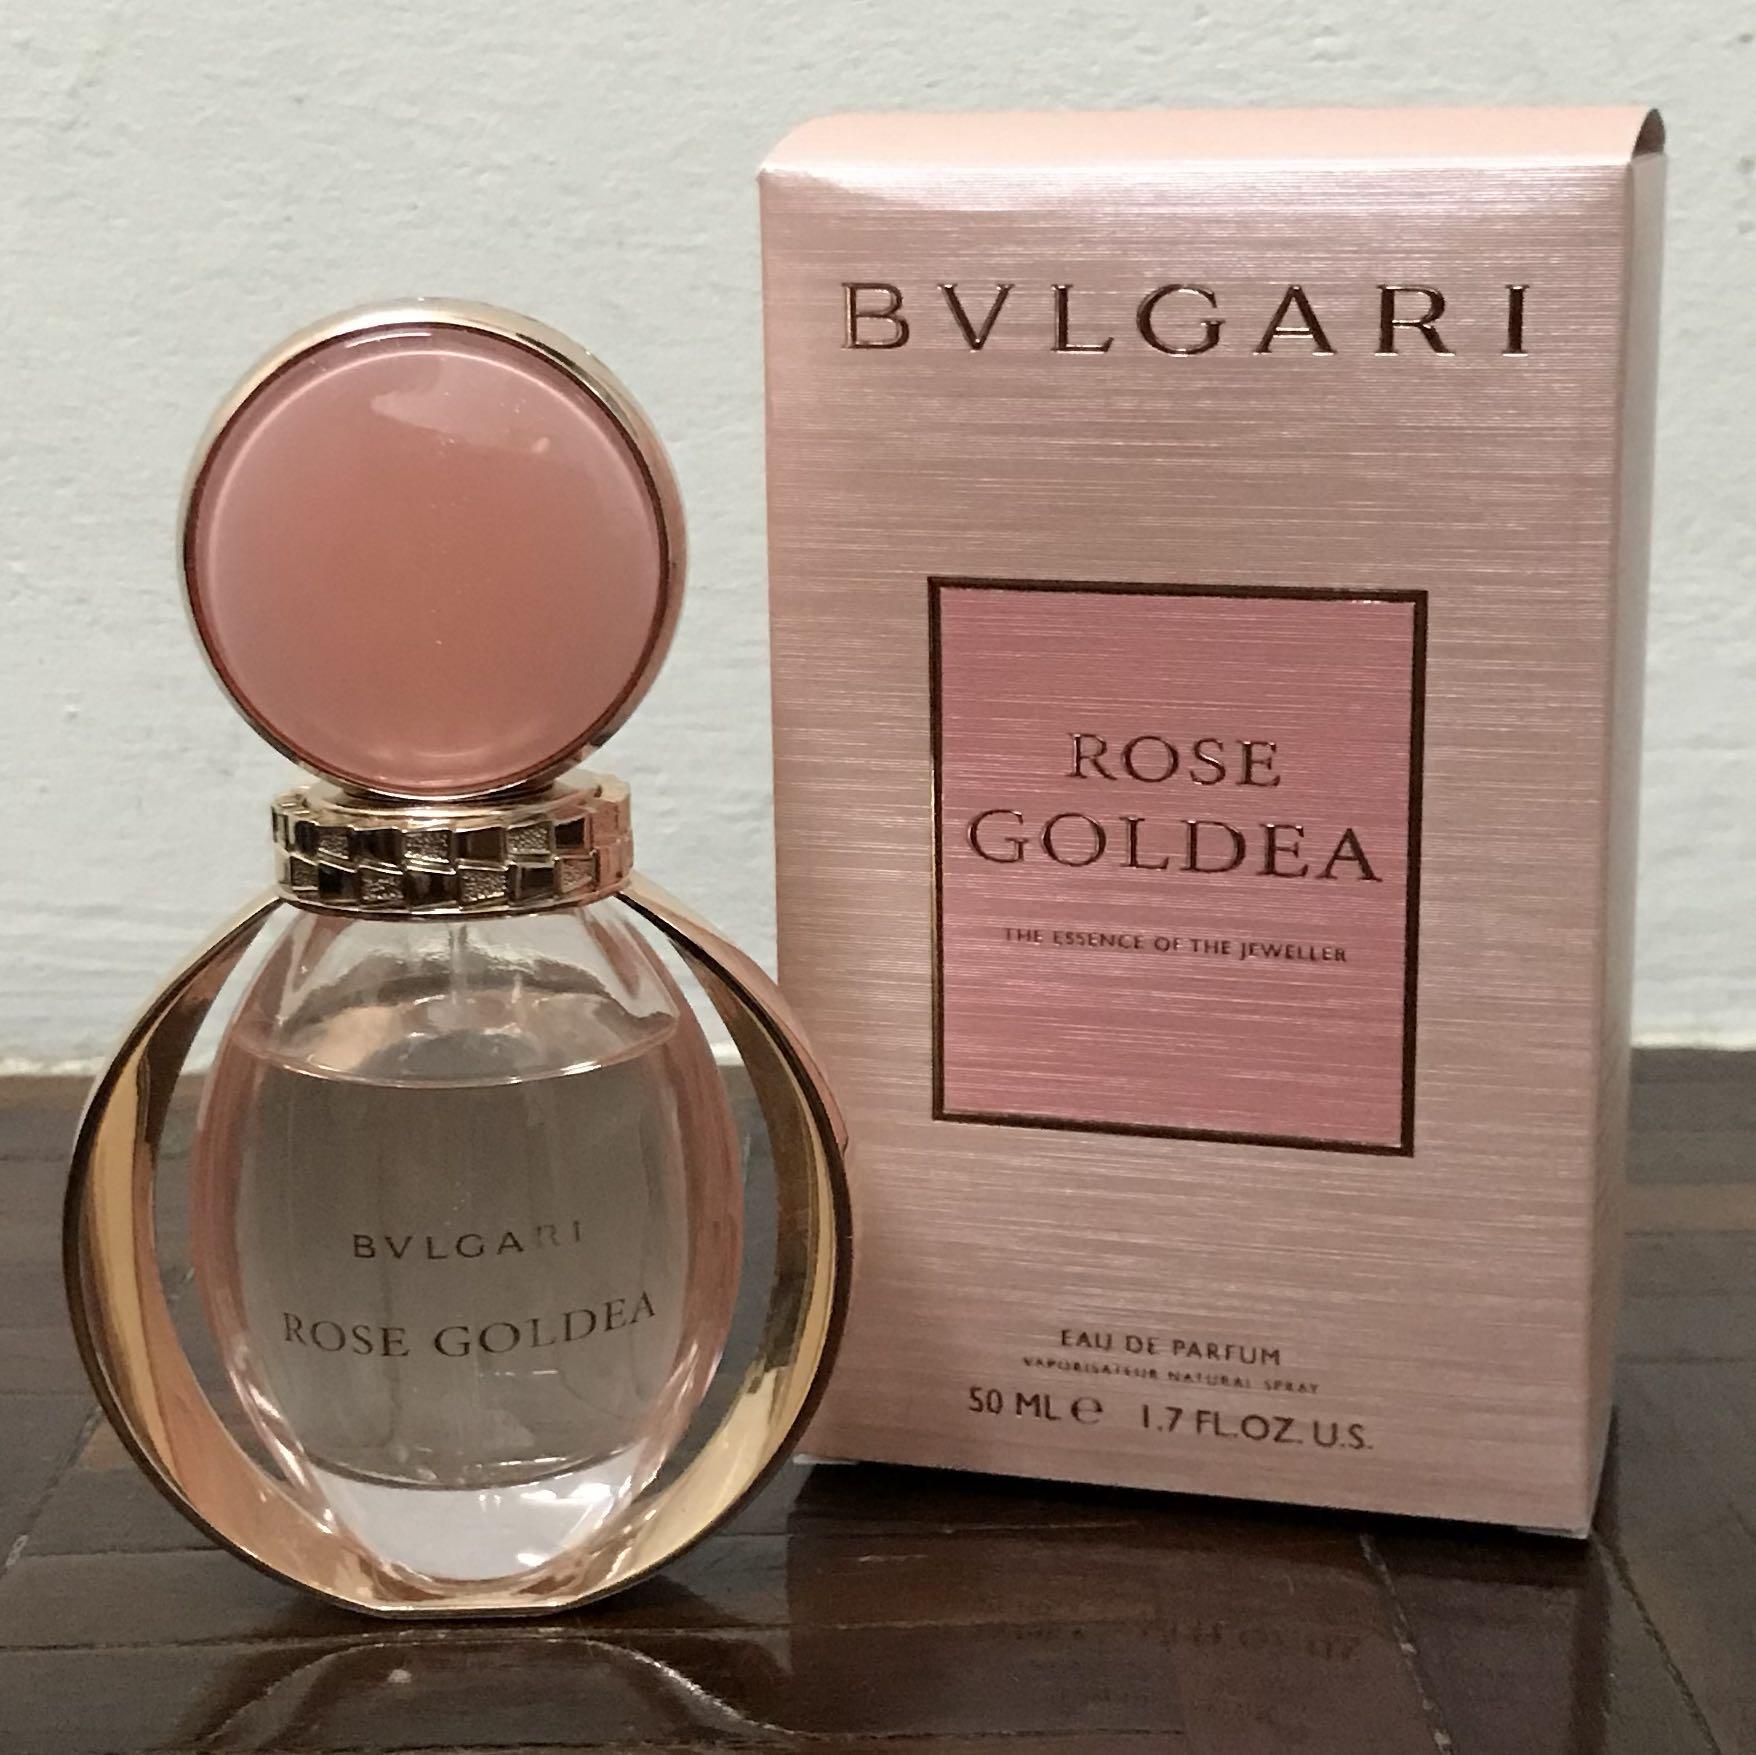 d0ffb5559bf Bvlgari Rose Goldea 50ml